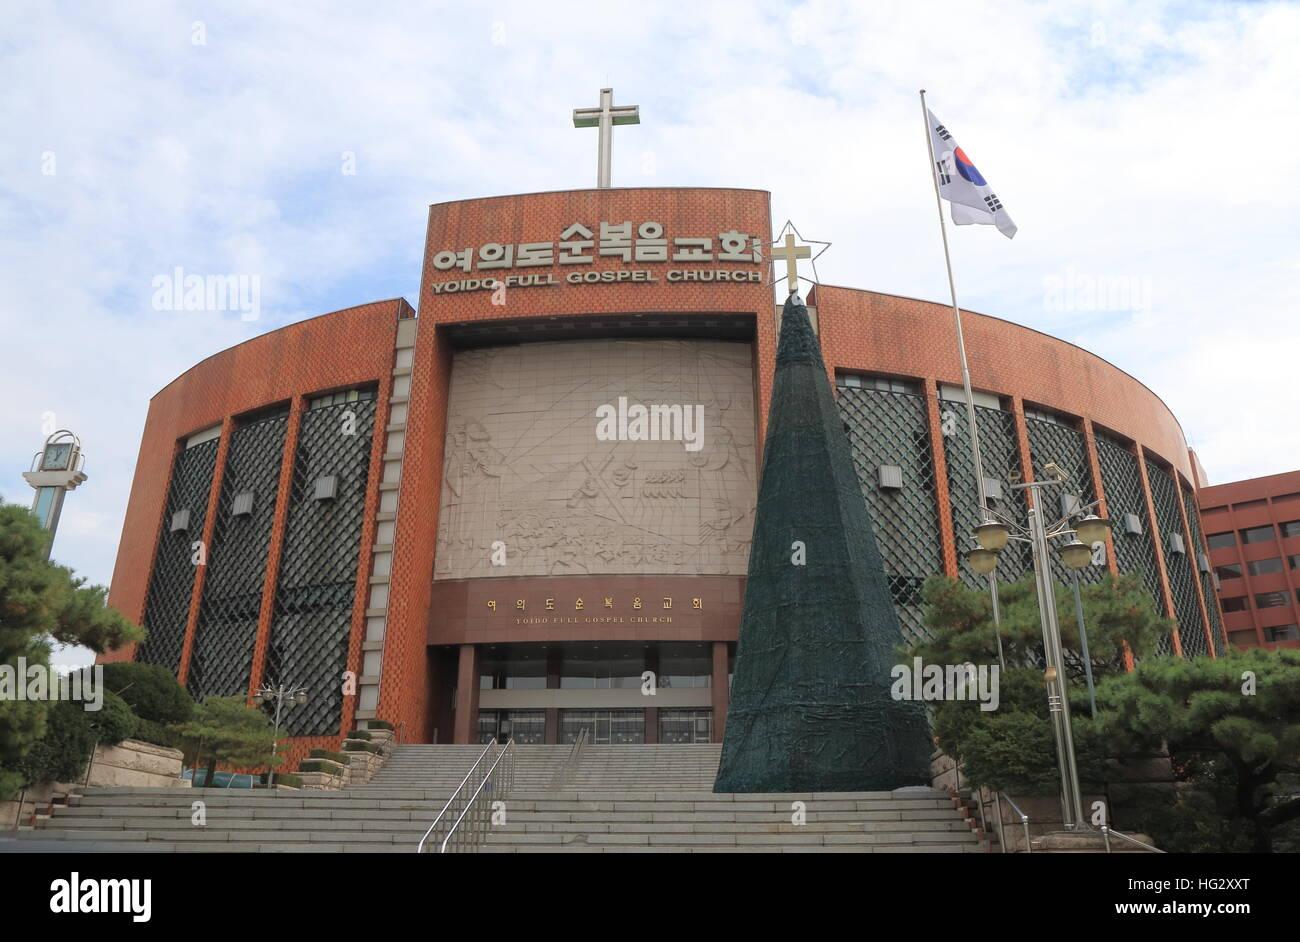 Yoido Full Gospel Church in Seoul South Korea. Yoido Full Gospel Church s a Pentecostal church affiliated with the - Stock Image